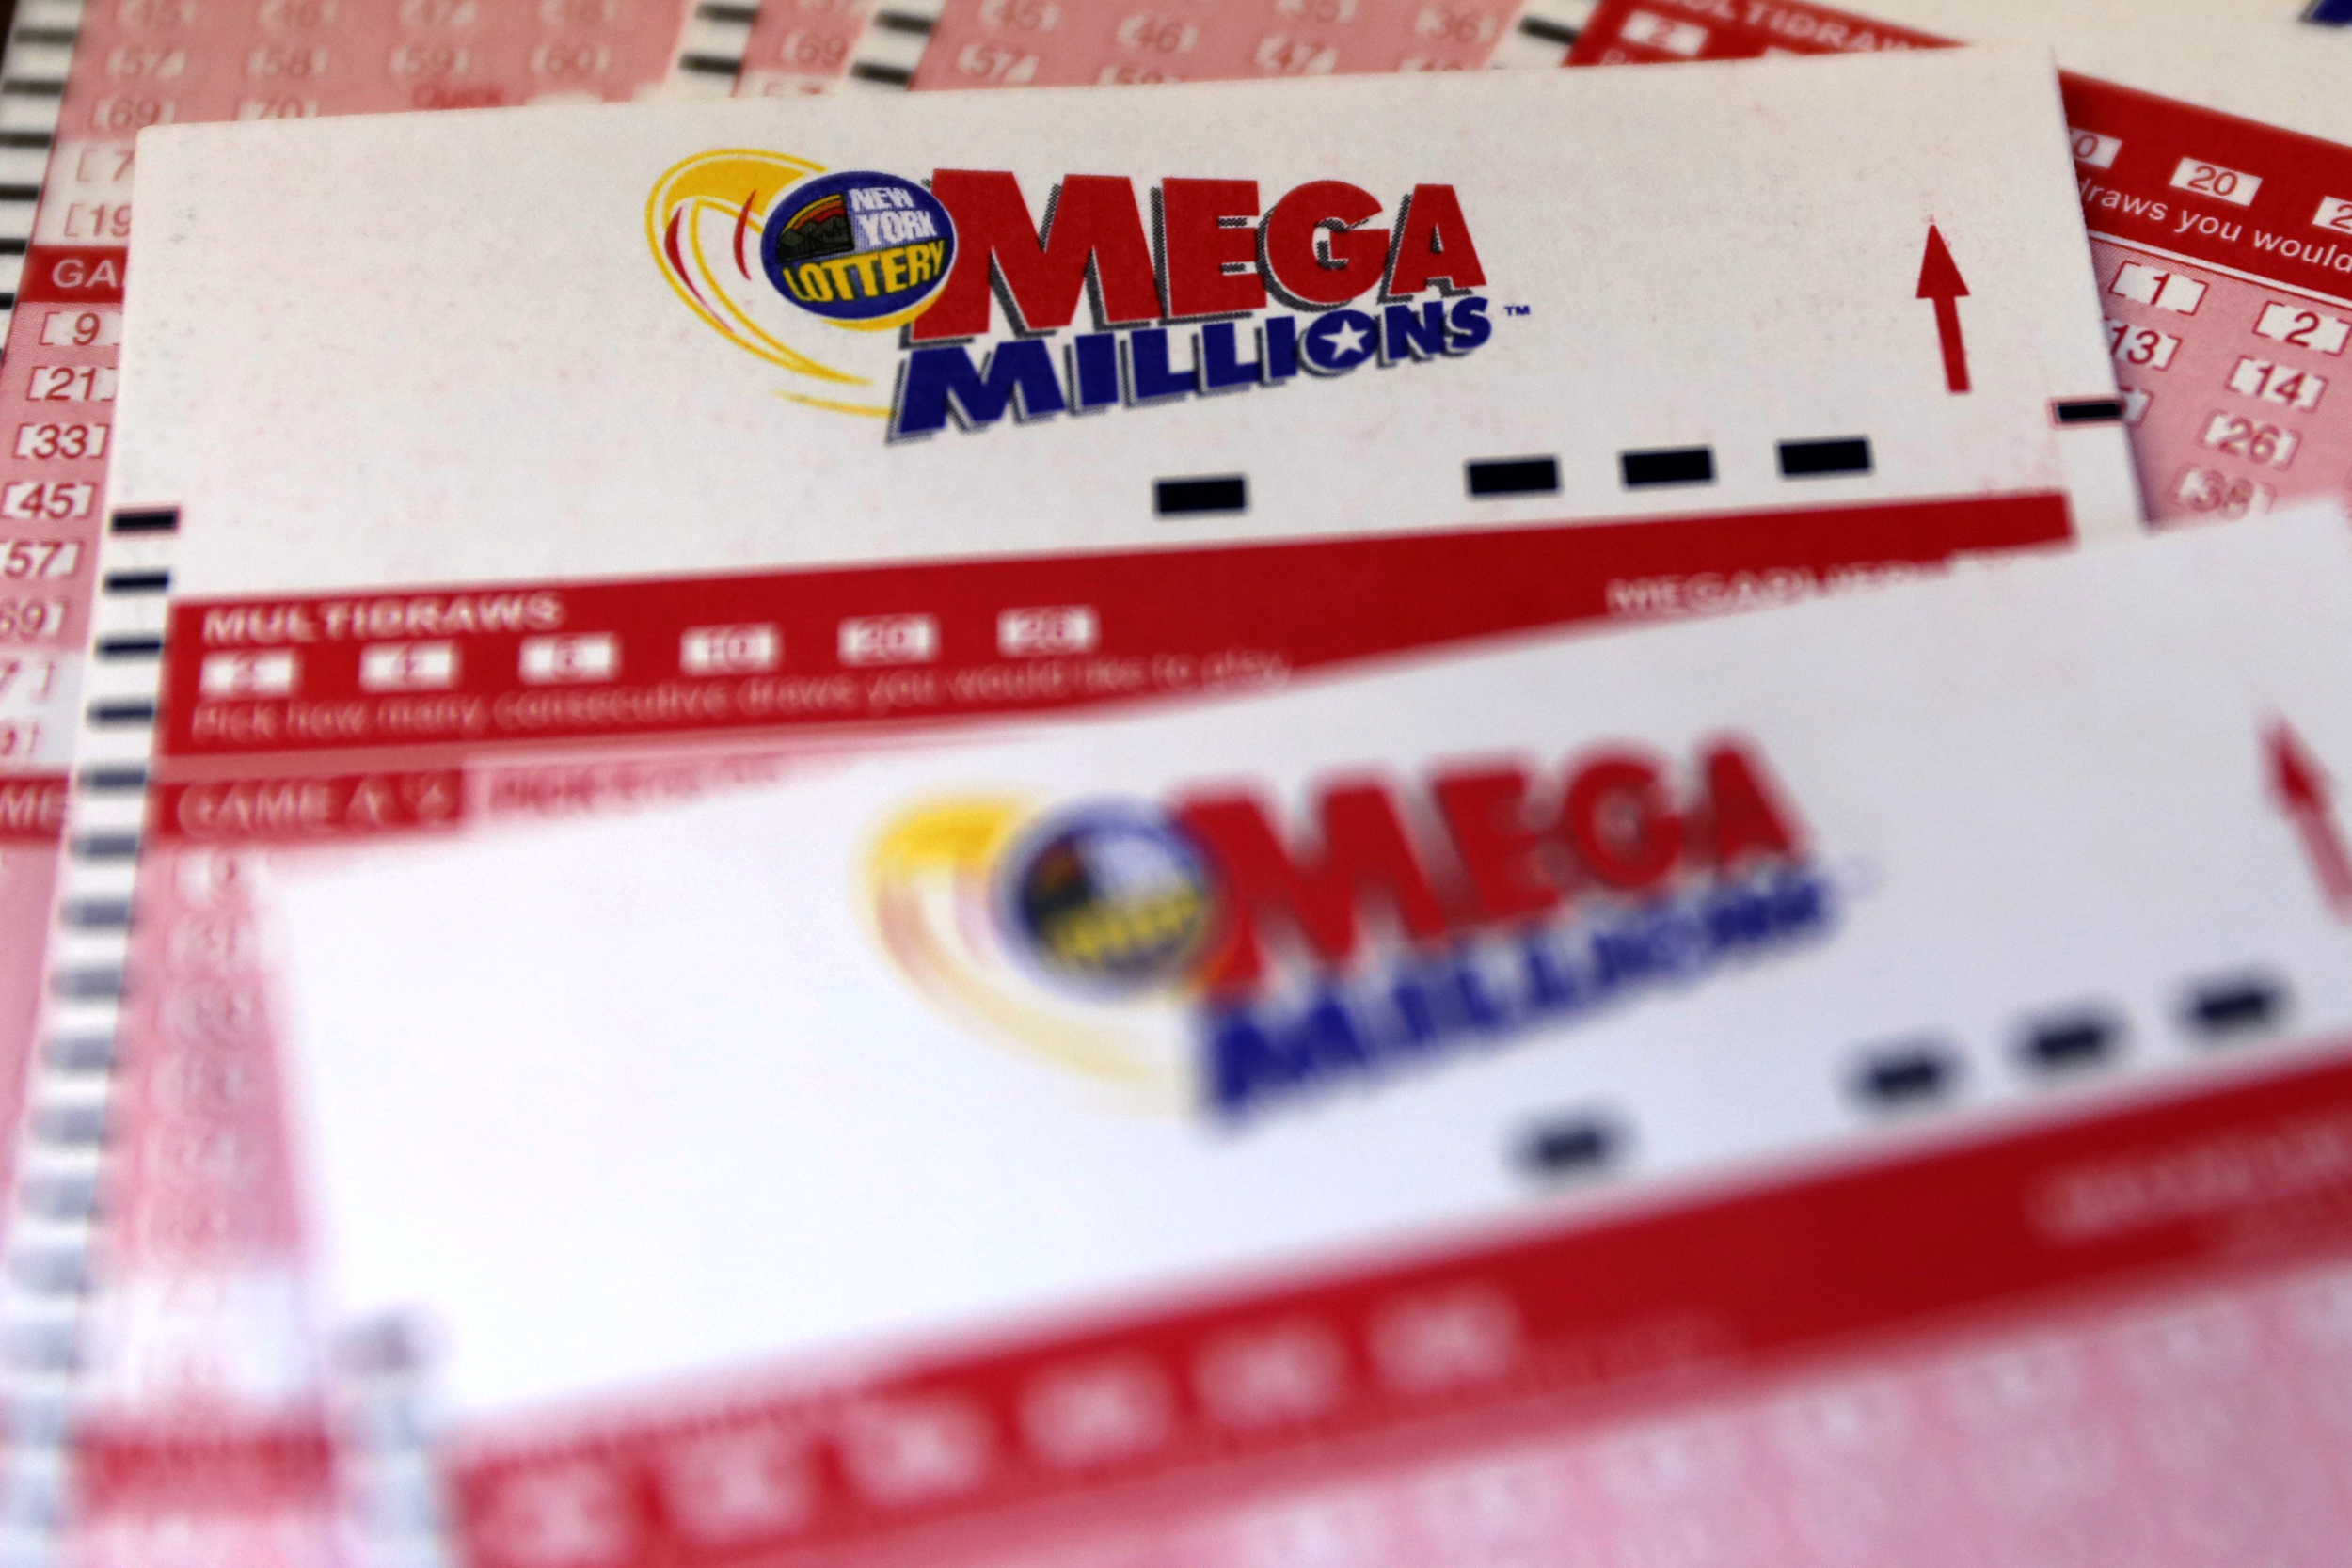 $432M Mega Millions ticket sold at N.Y.C. pizzeria